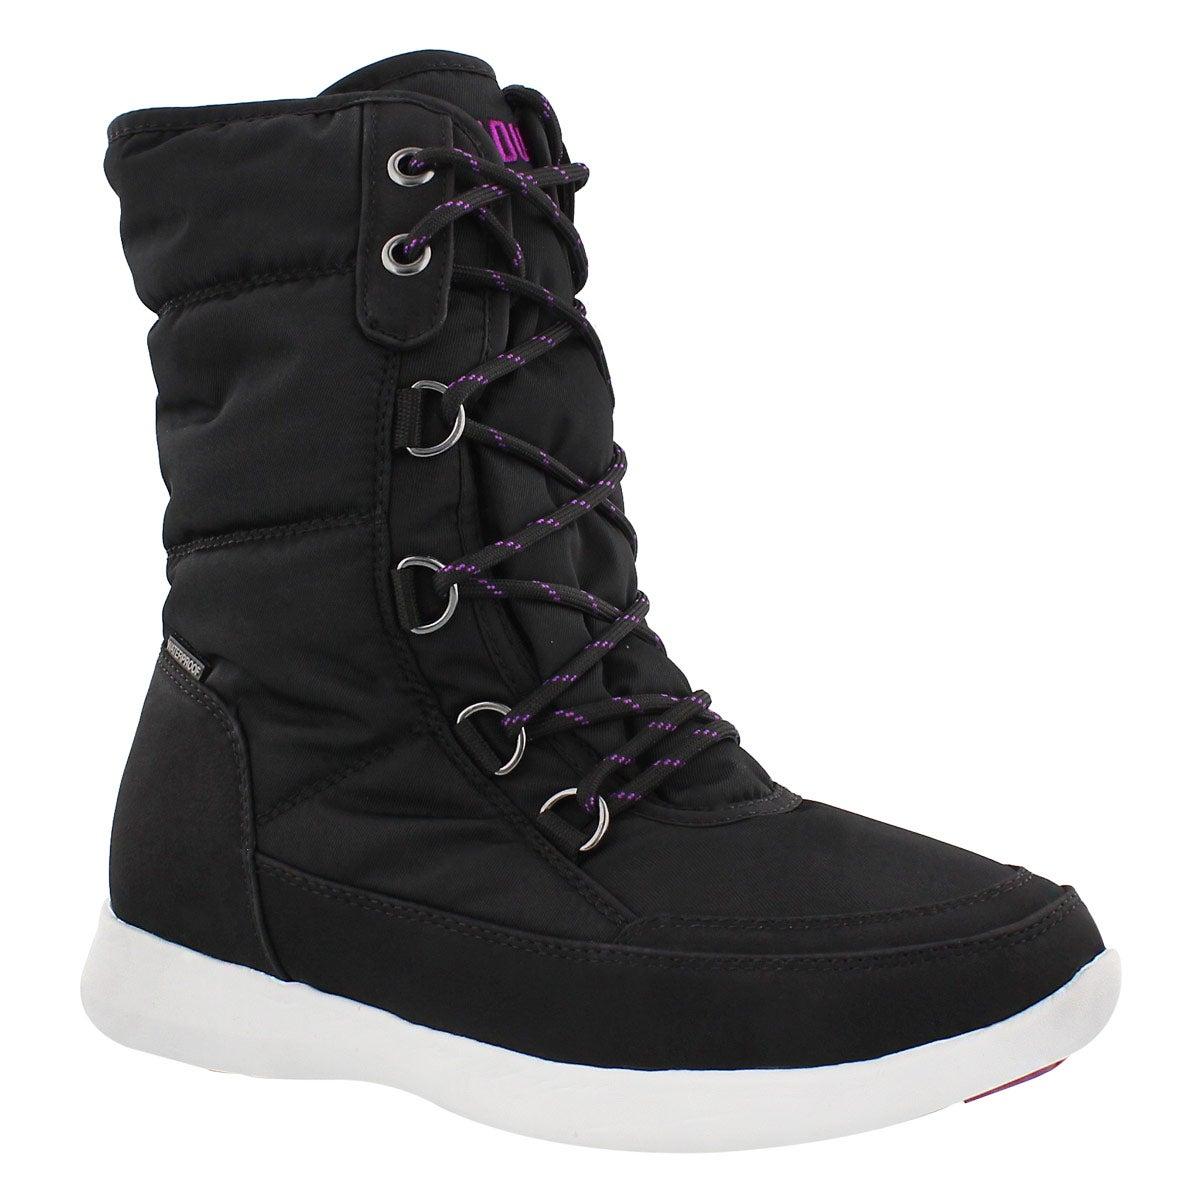 Lds Wagu blk wtpf lace up winter boot